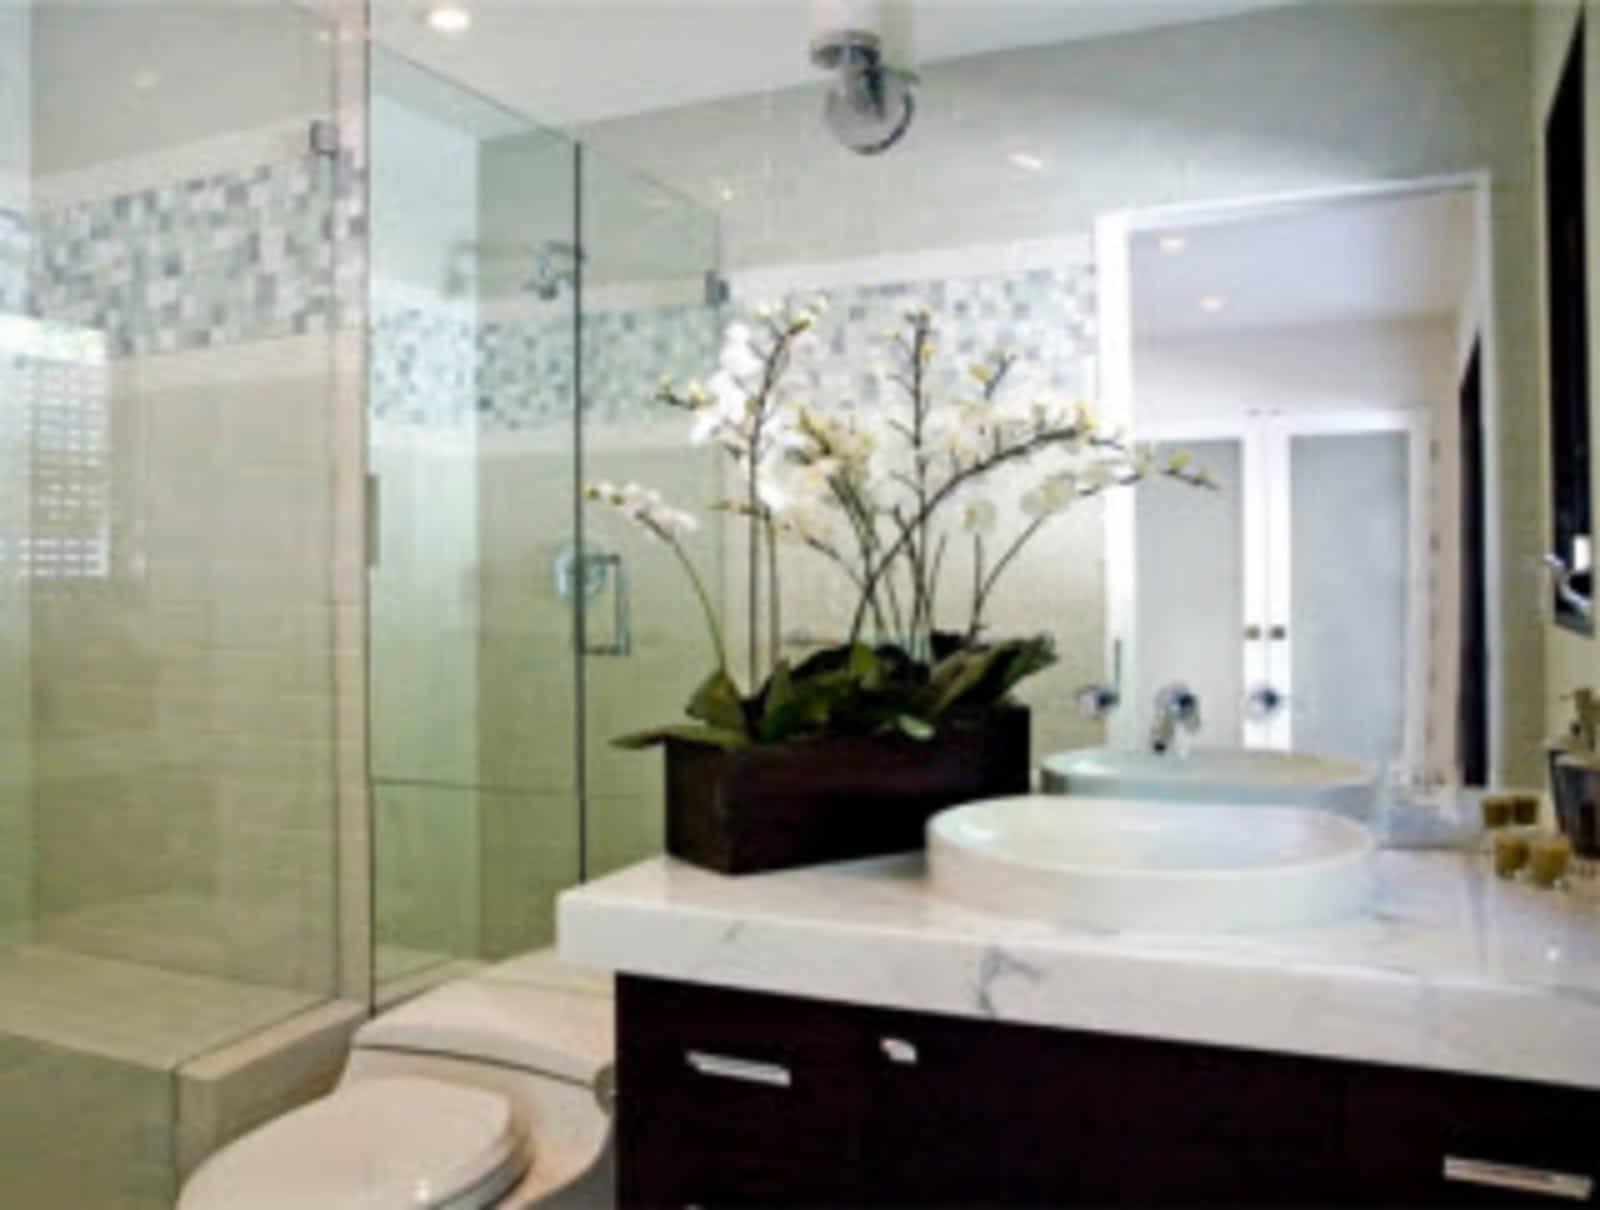 Enchanting Bain Maax Mold - Bathtub Design Ideas - valtak.com